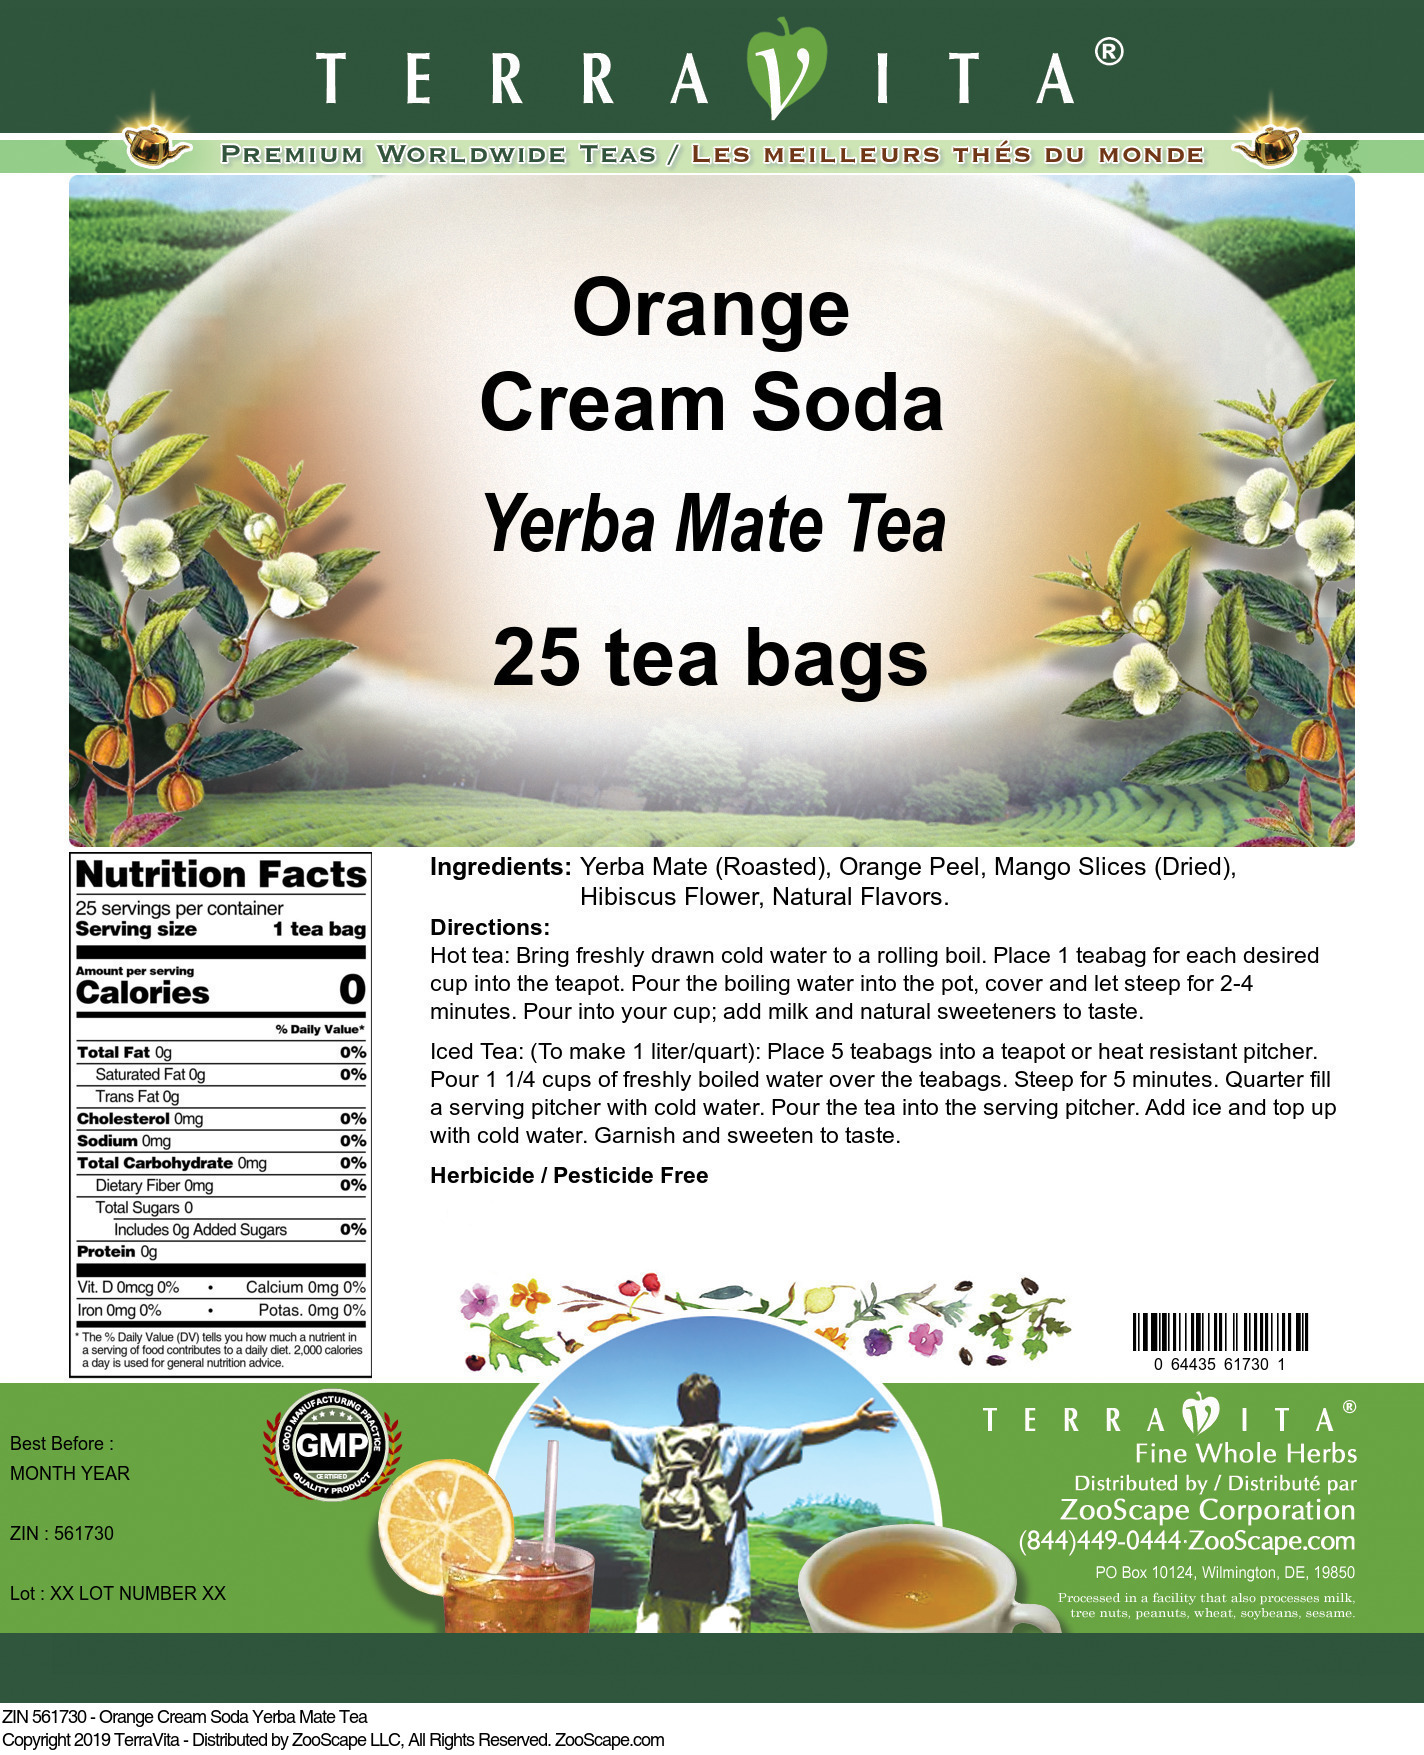 Orange Cream Soda Yerba Mate